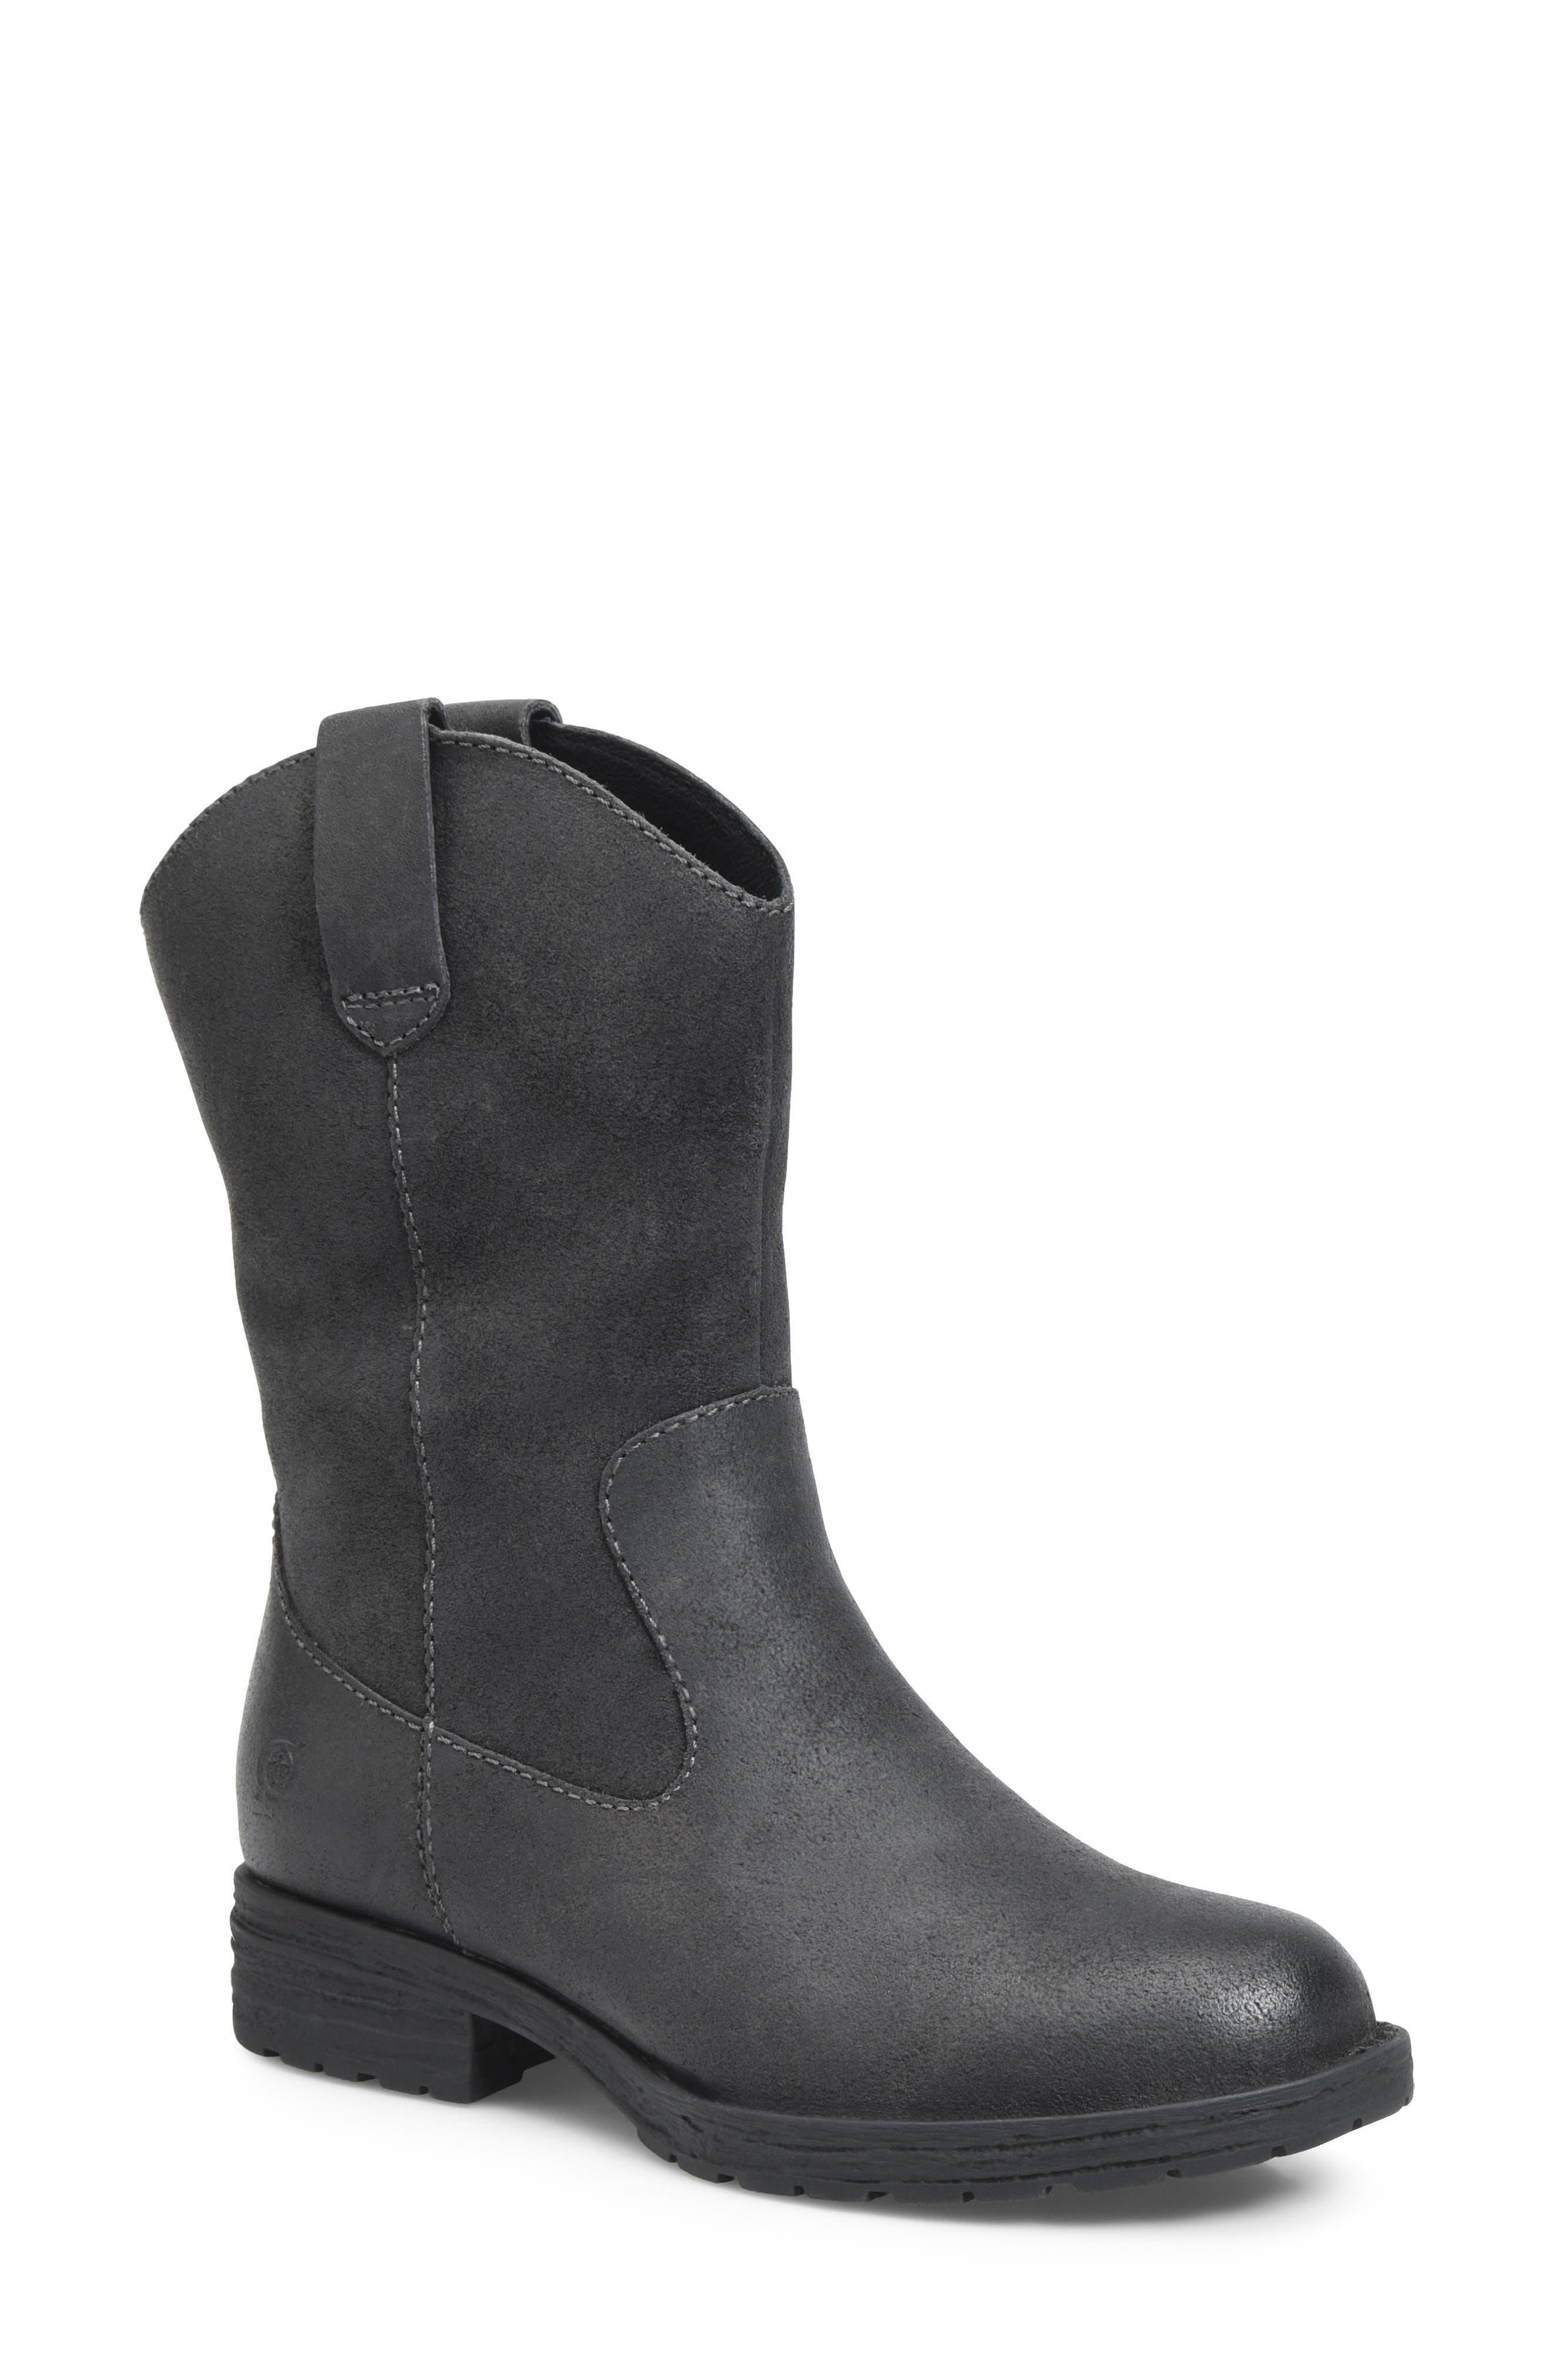 B?rn Basin Waterproof Western Boot, Grey